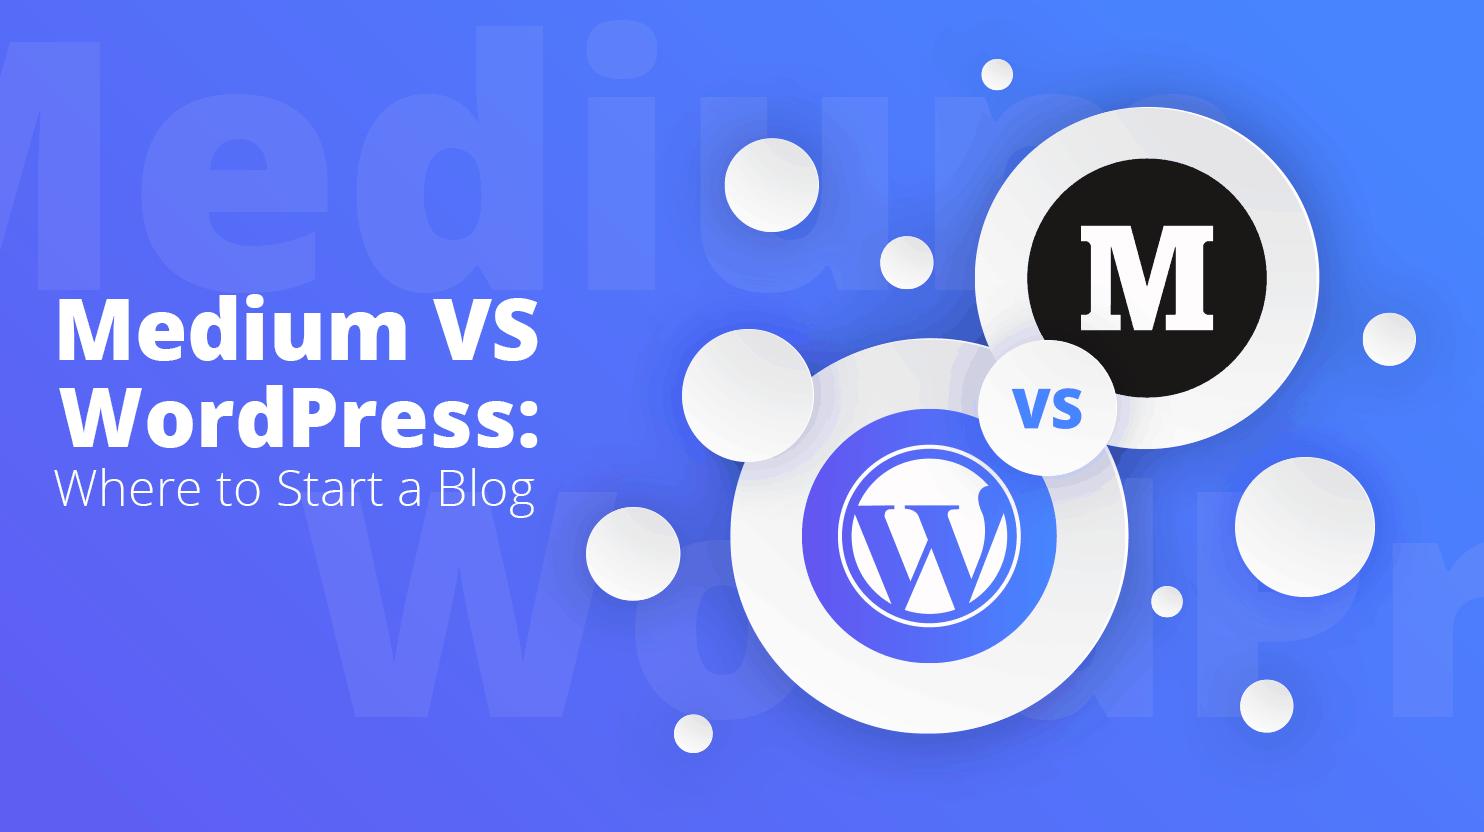 Medium VS WordPress: Where to Start a Blog